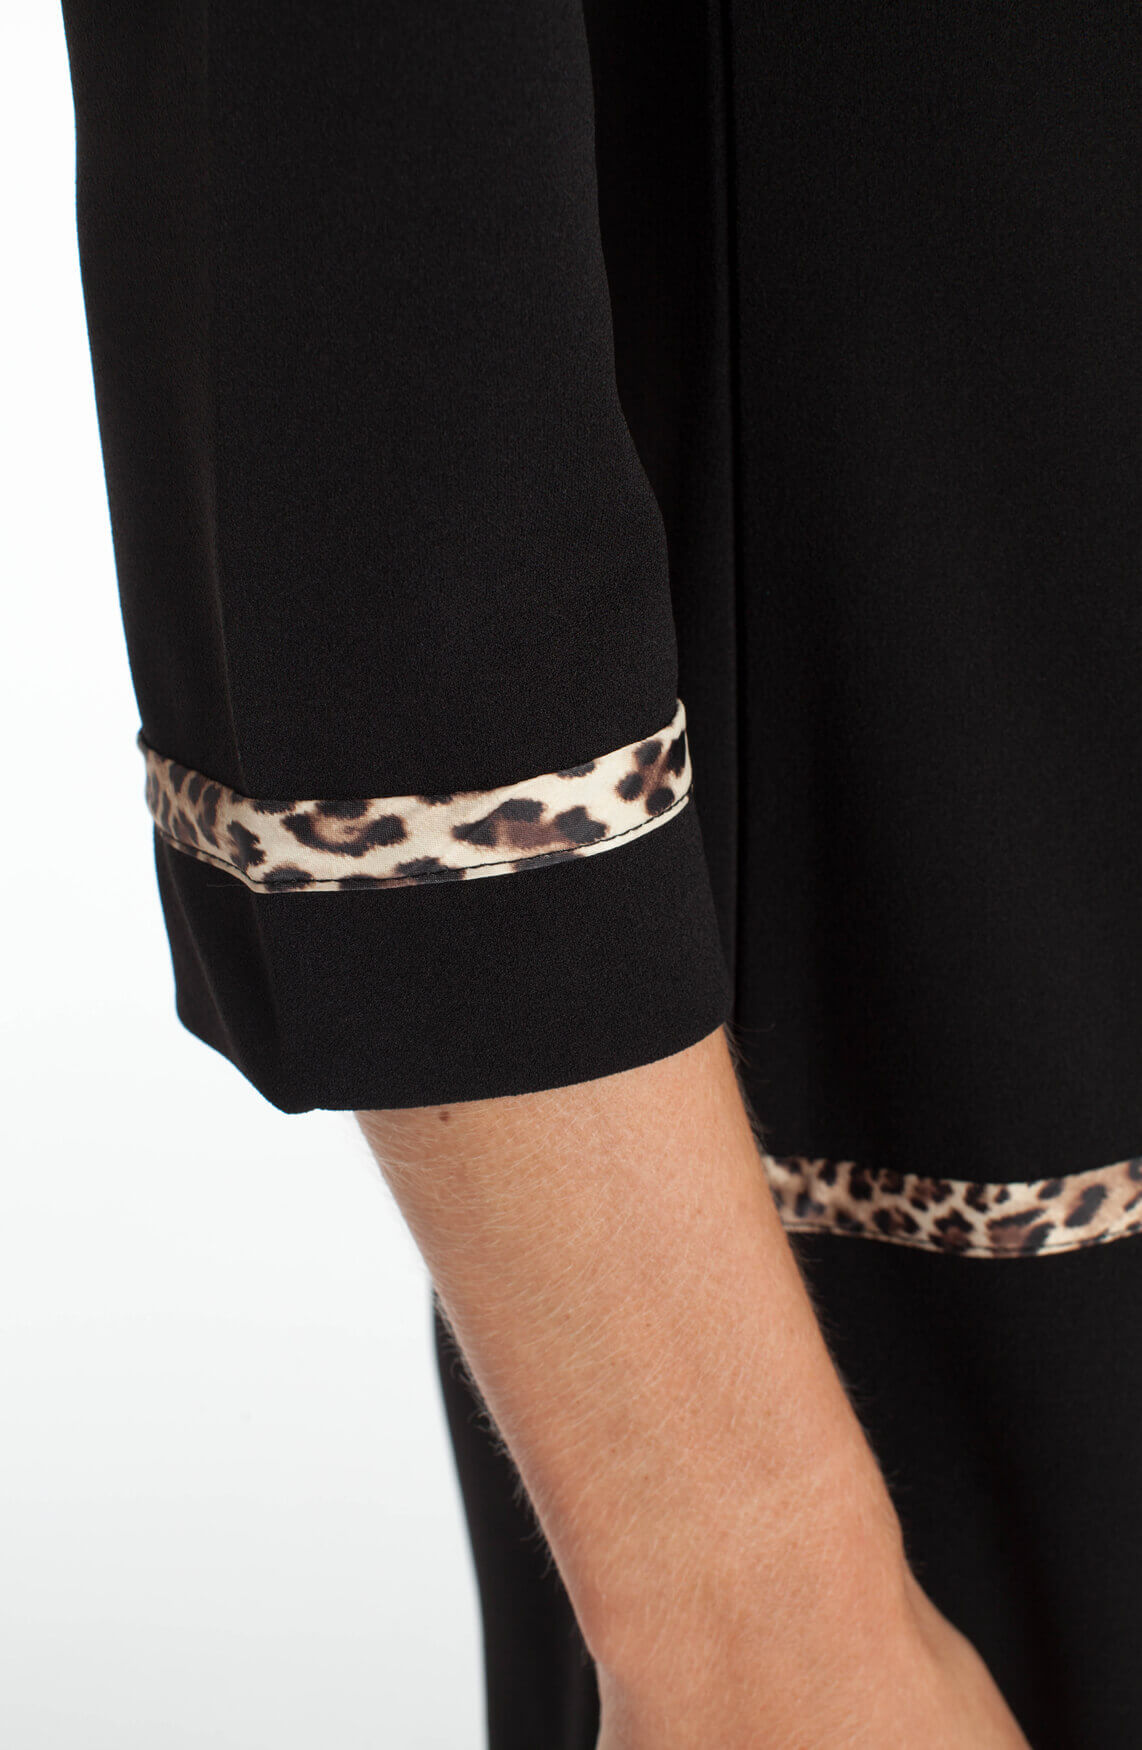 Ana Alcazar Dames Jurk met panter detail zwart